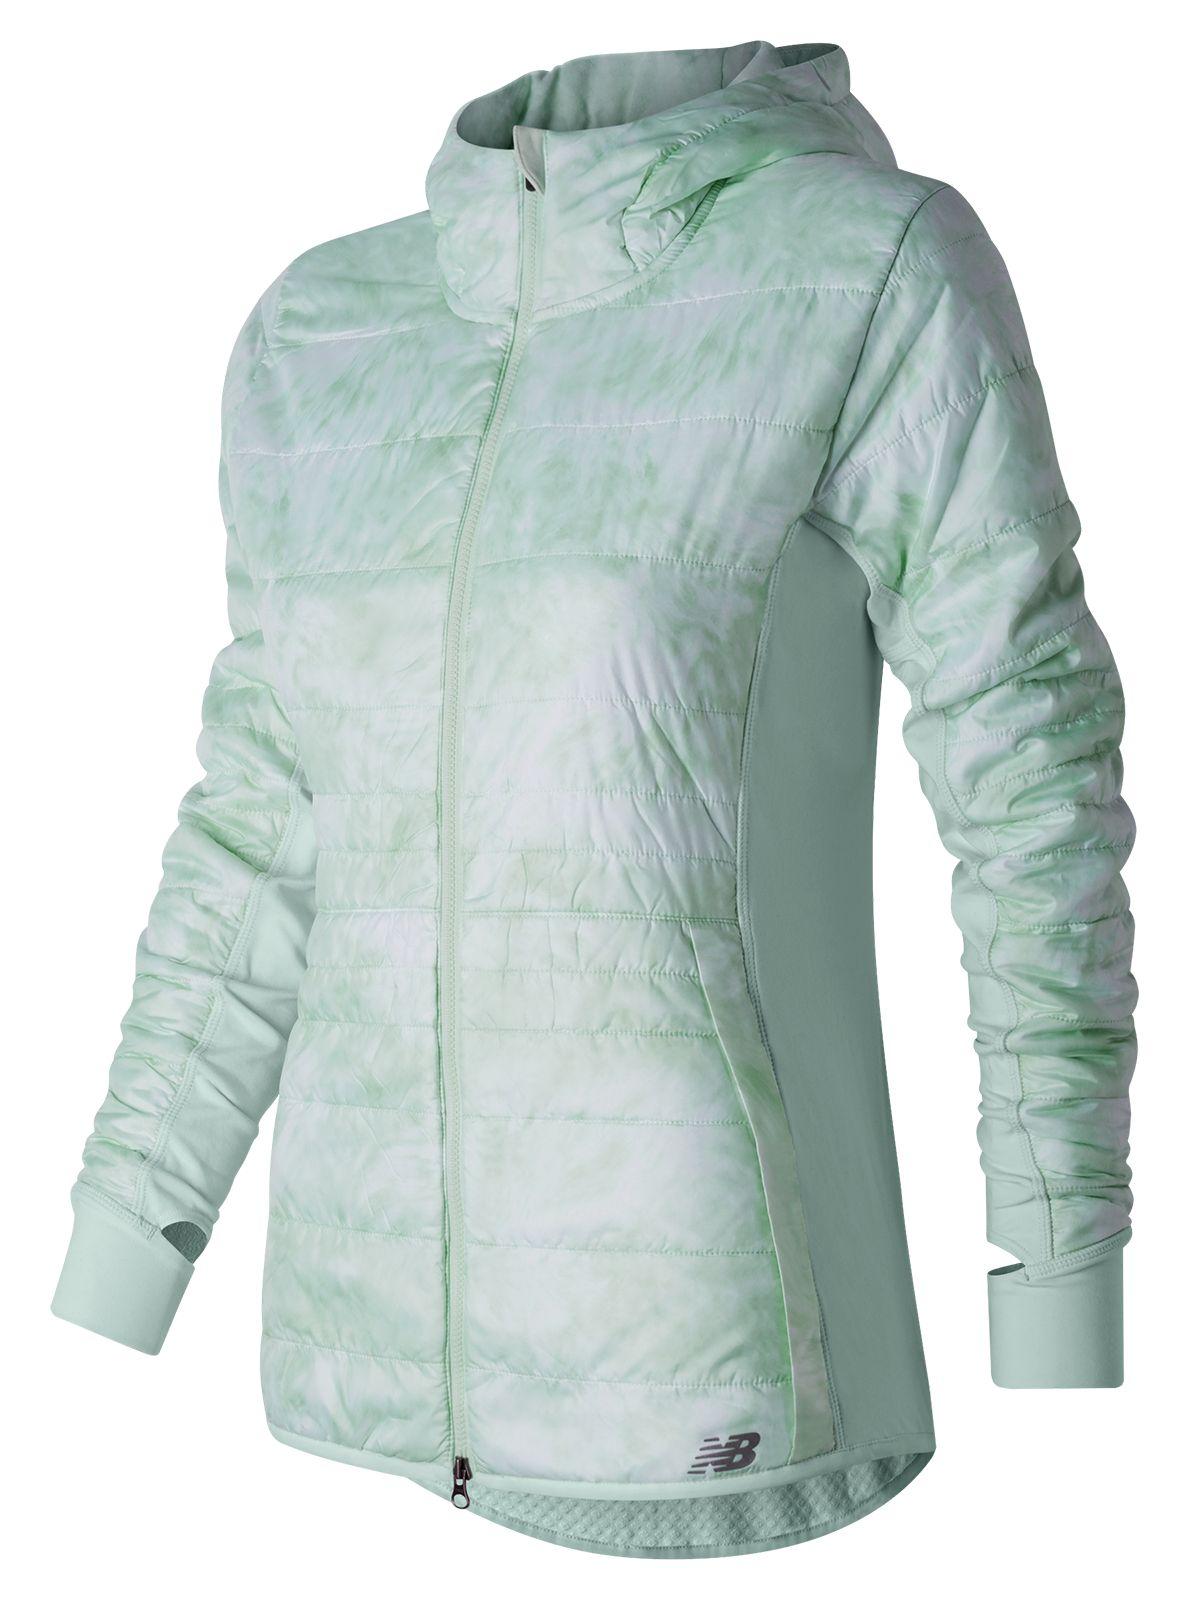 New Balance : NB Heat Hybrid Jacket : Women's Apparel : WJ63120DFP